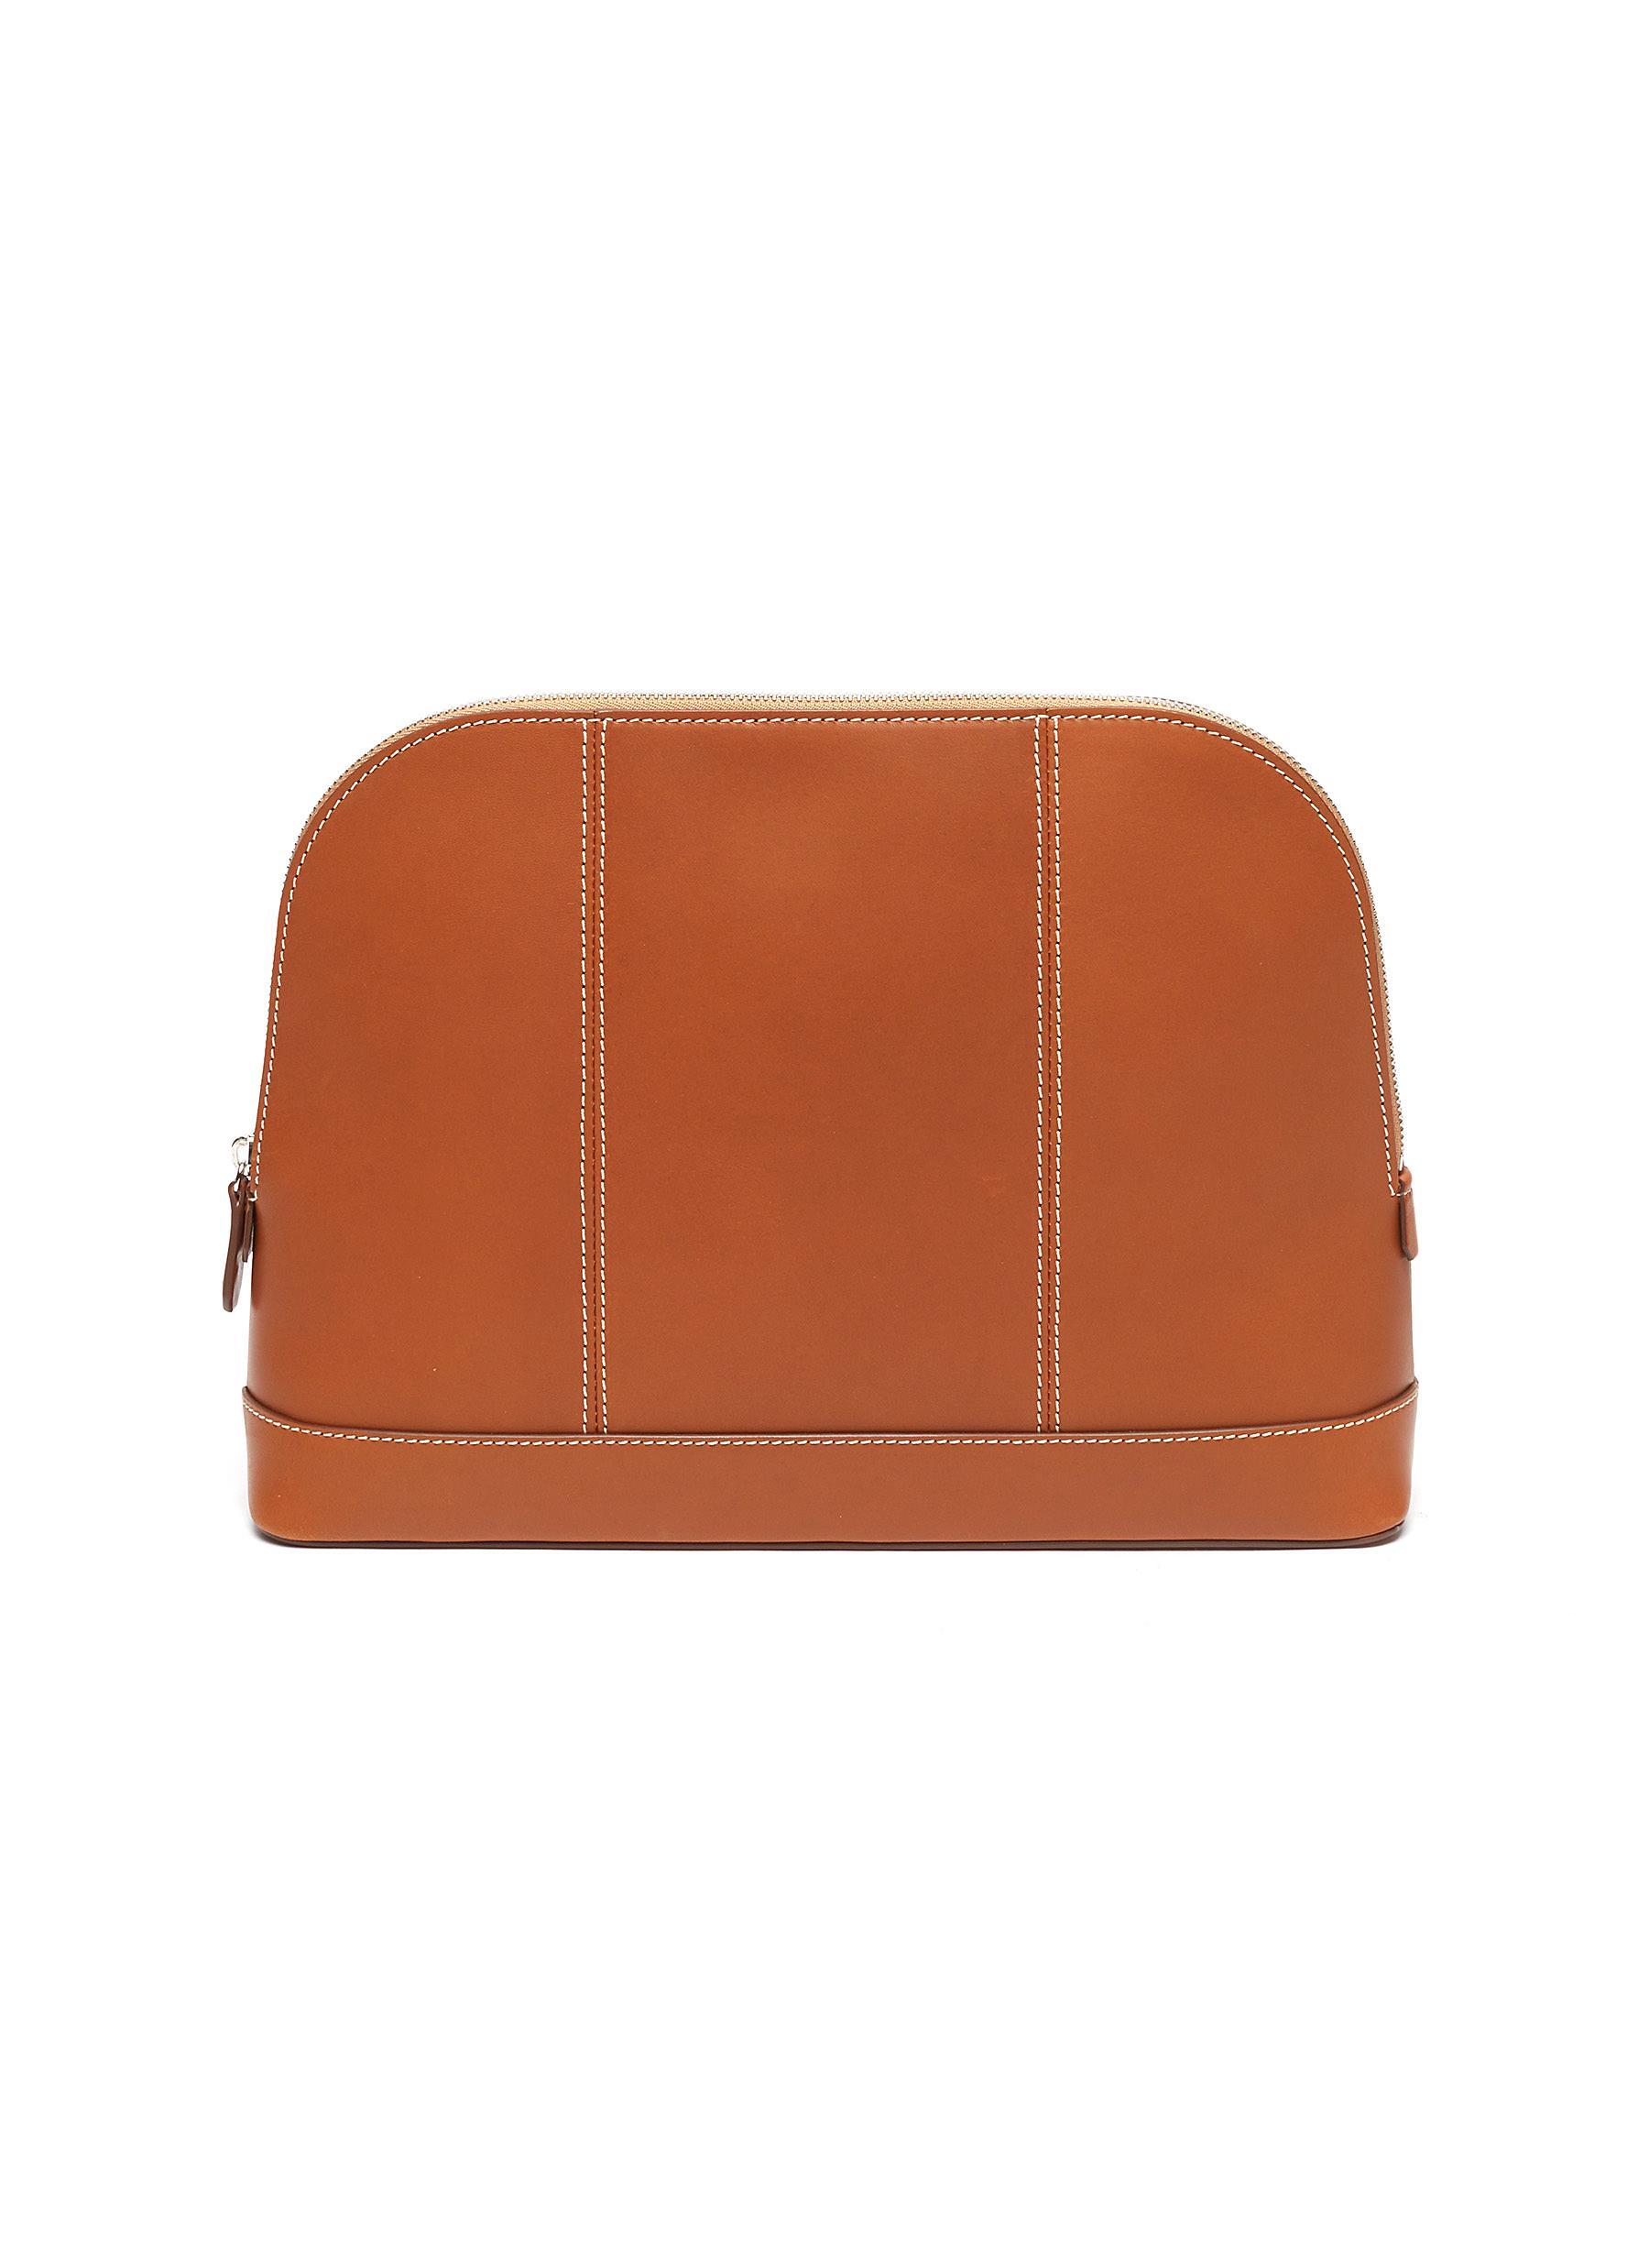 Large leather wash bag